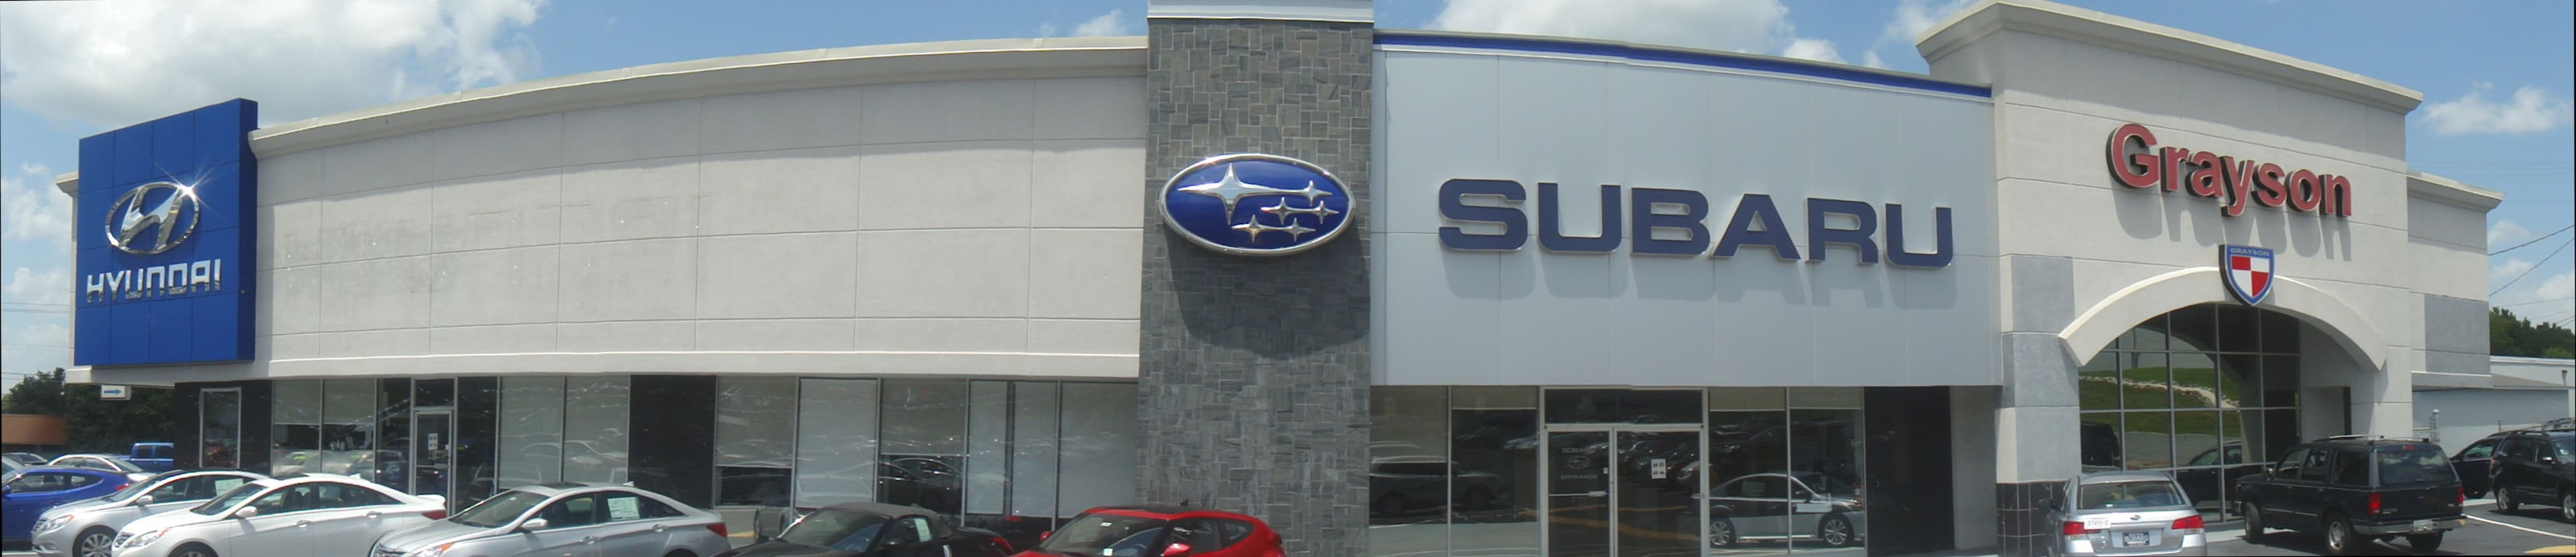 new subaru used car dealership in knoxville tn. Black Bedroom Furniture Sets. Home Design Ideas